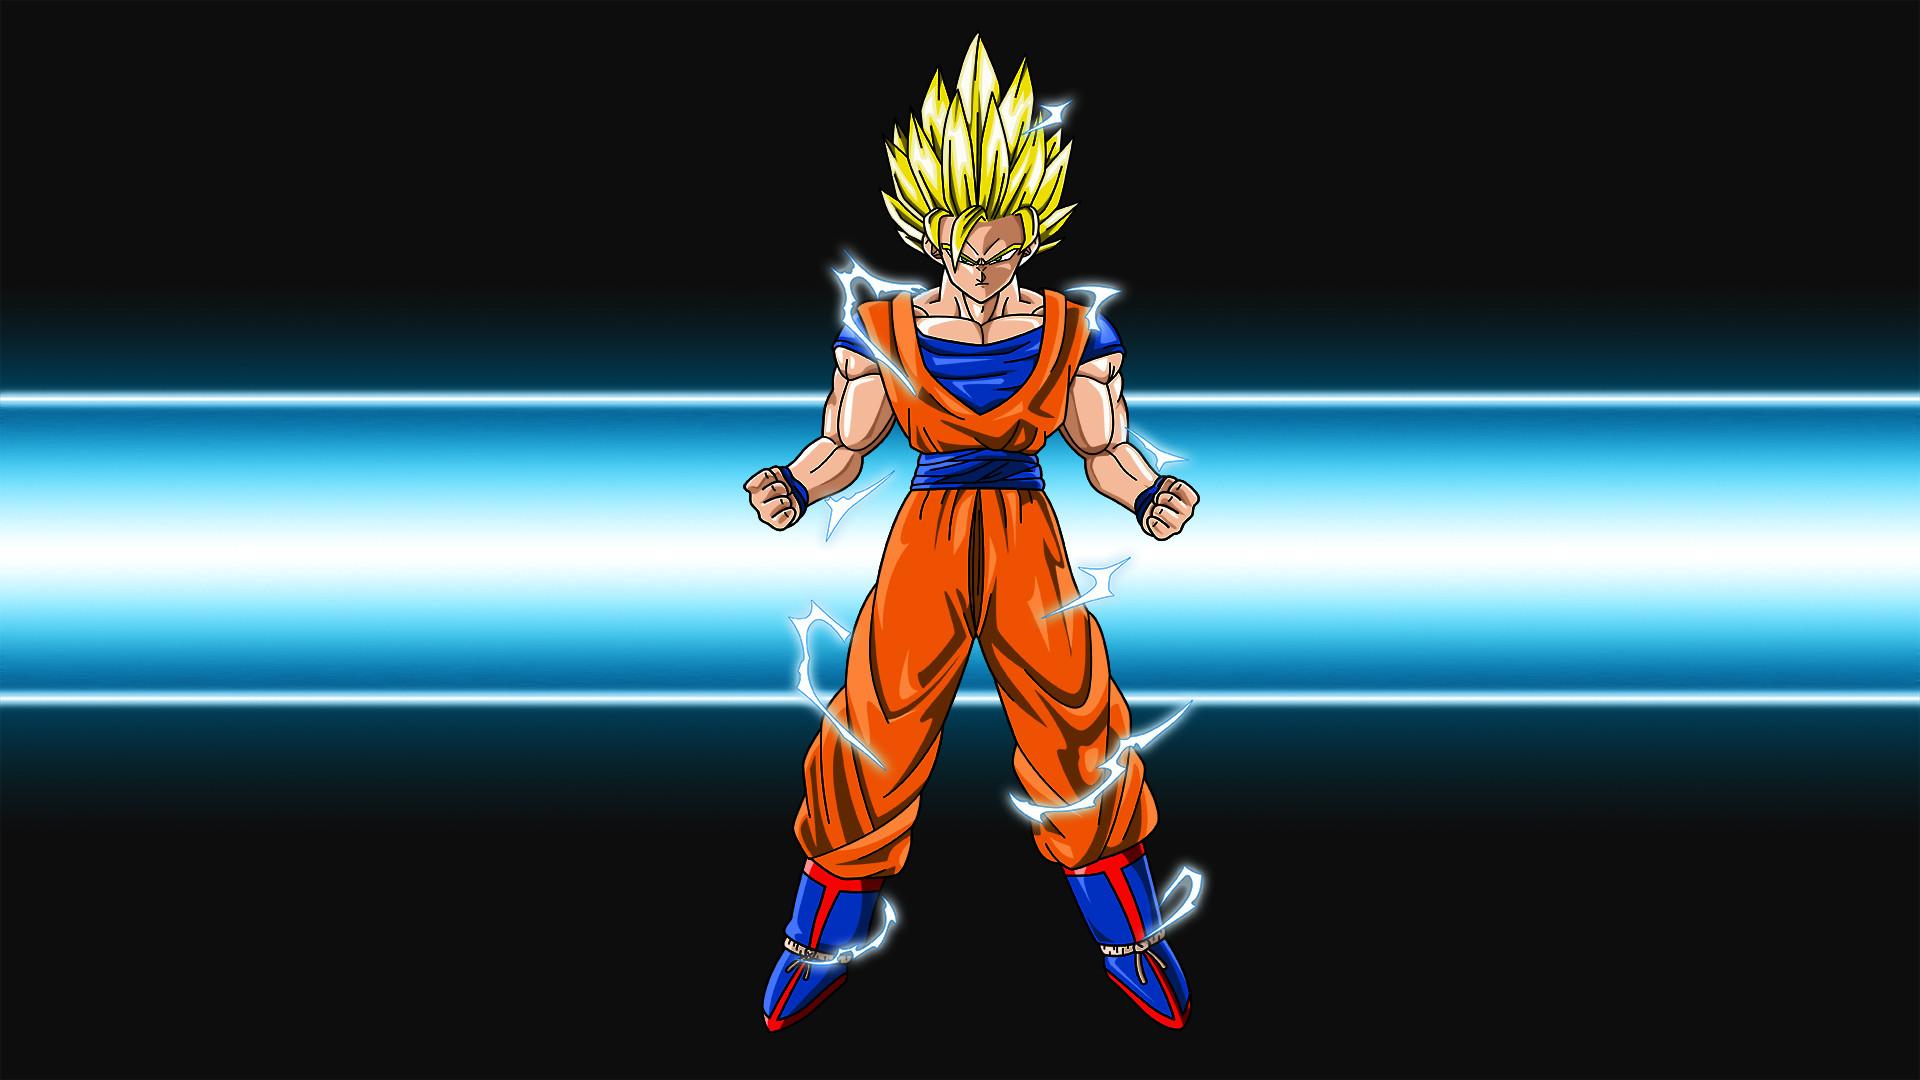 Goku Super Saiyan 4 Wallpaper (66+ Images